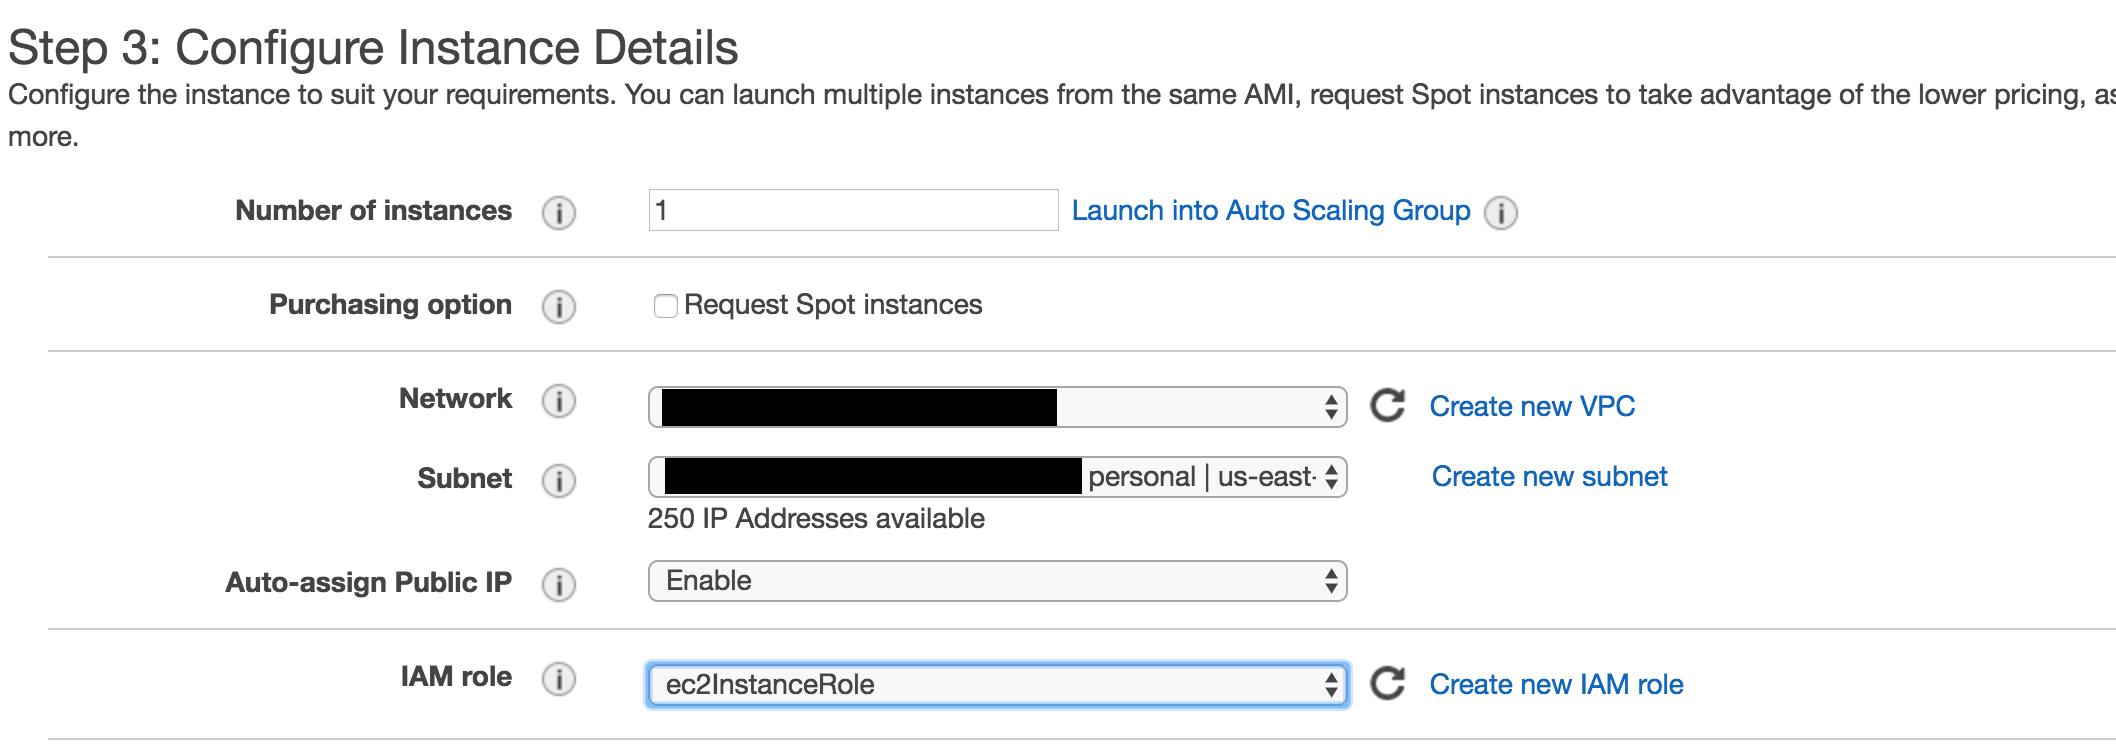 Configure the instance